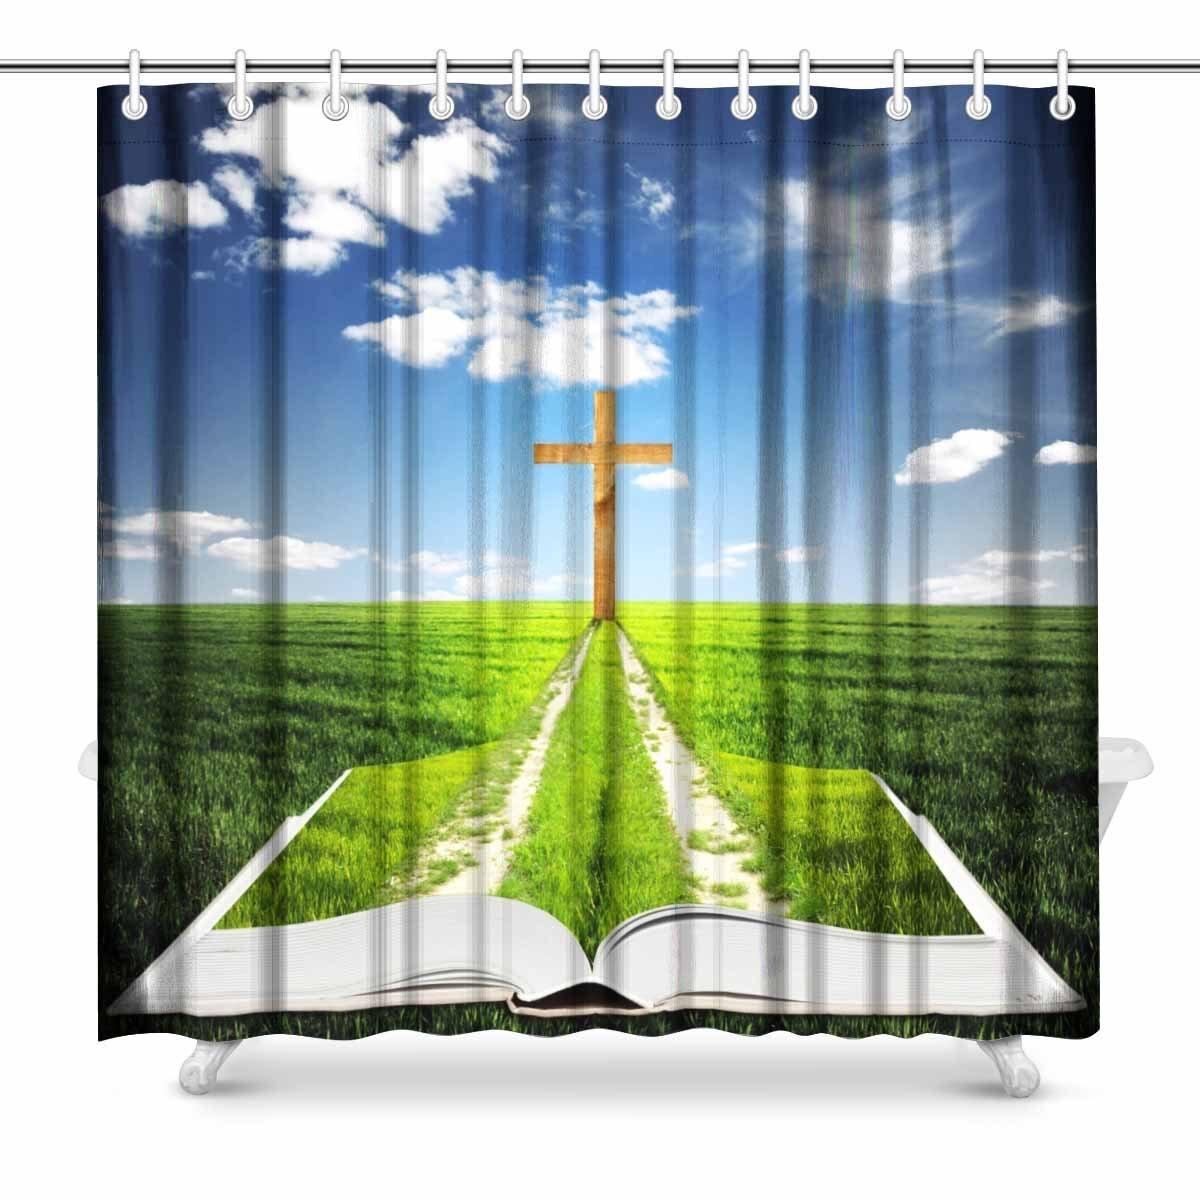 Cross Easter Stars Fabric Shower Curtain Set 72x72 Bathroom